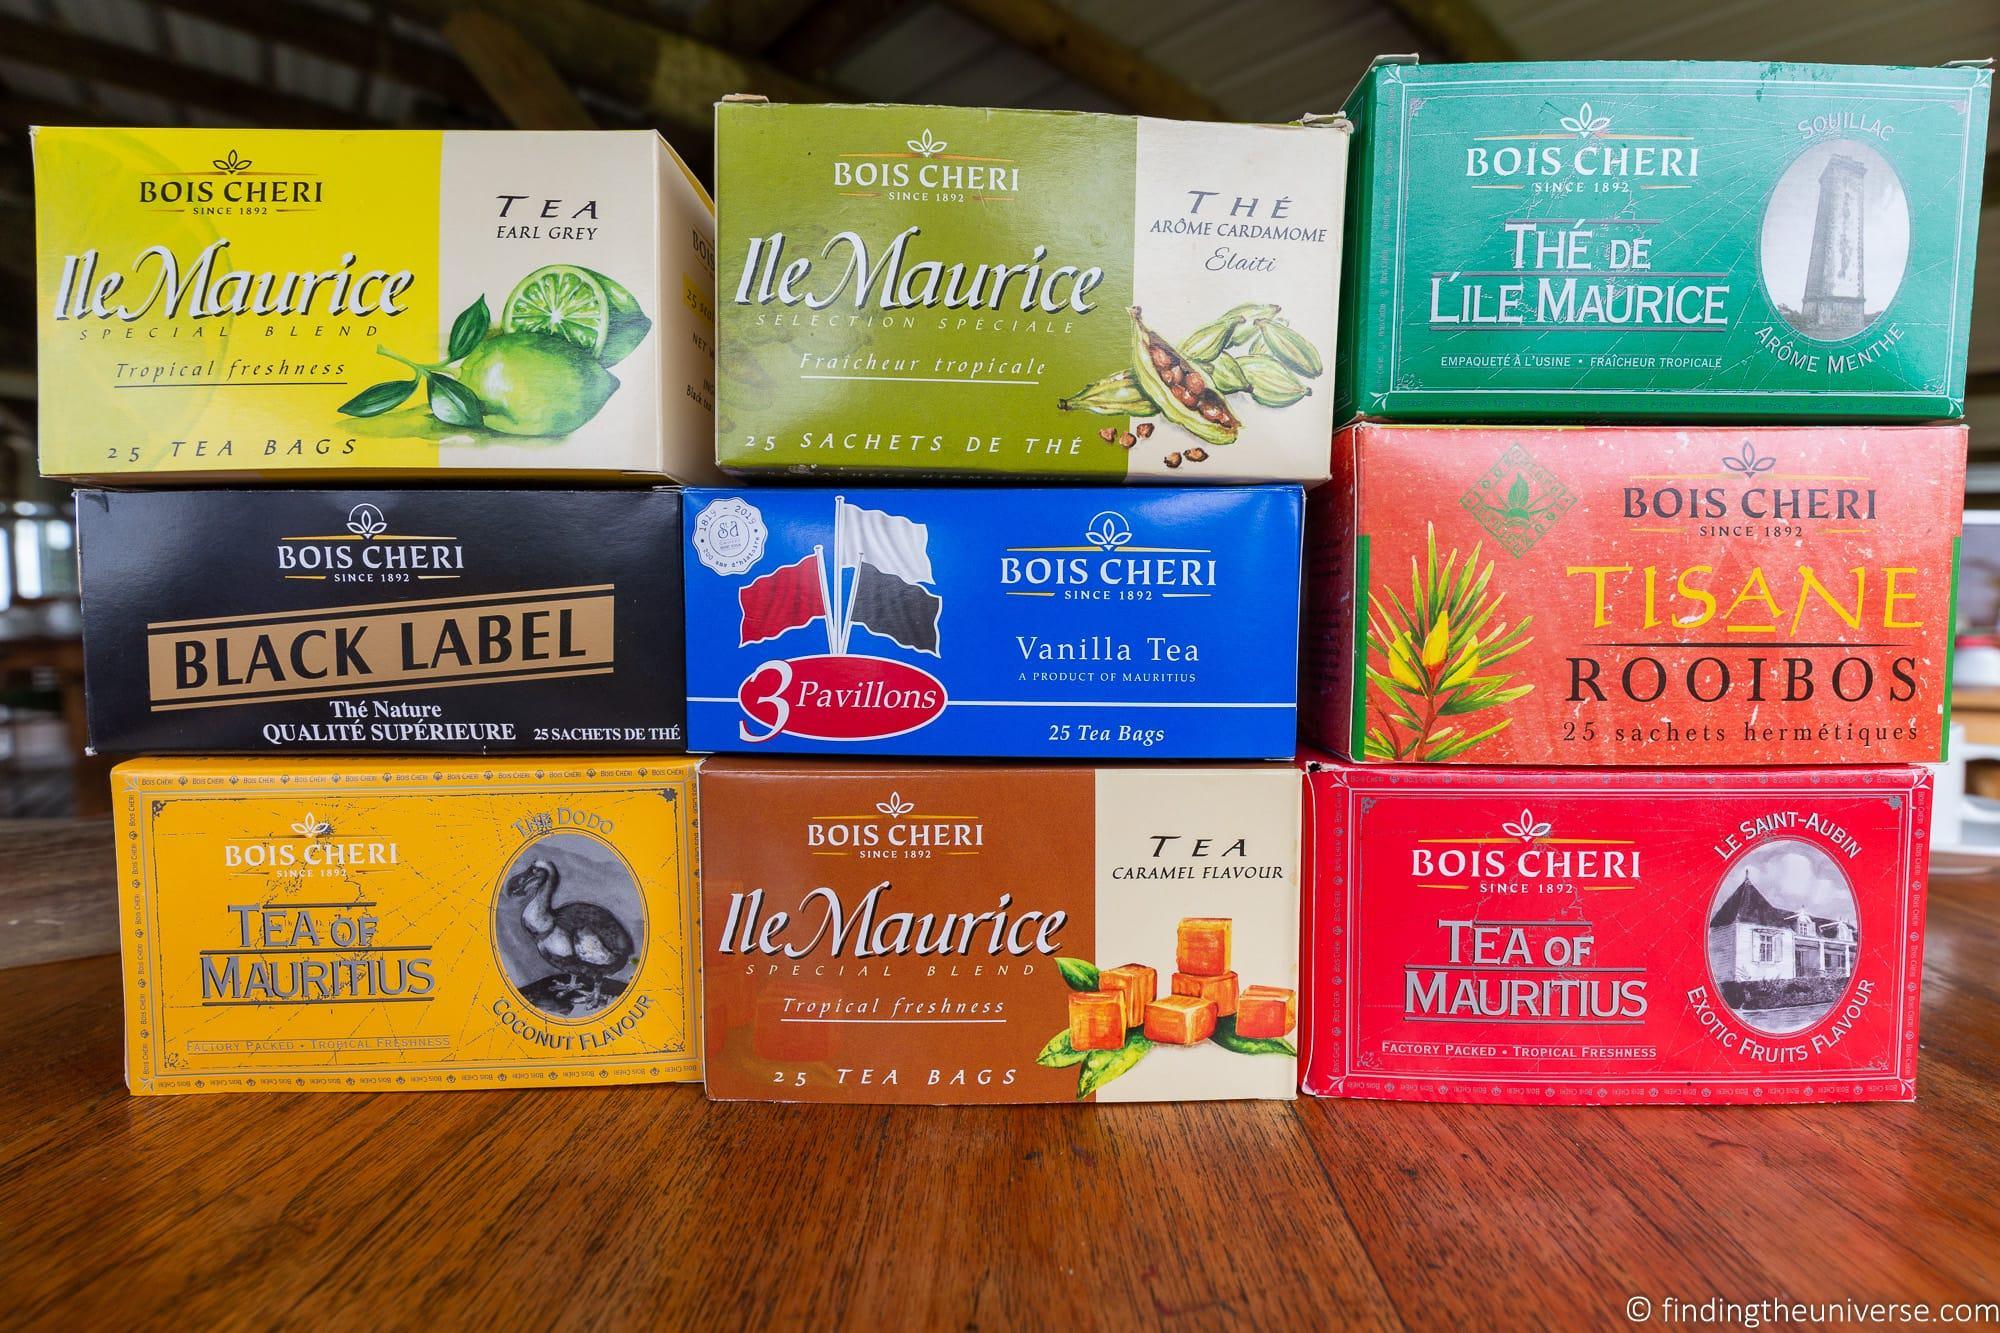 Bois Cheri Tea Mauritius